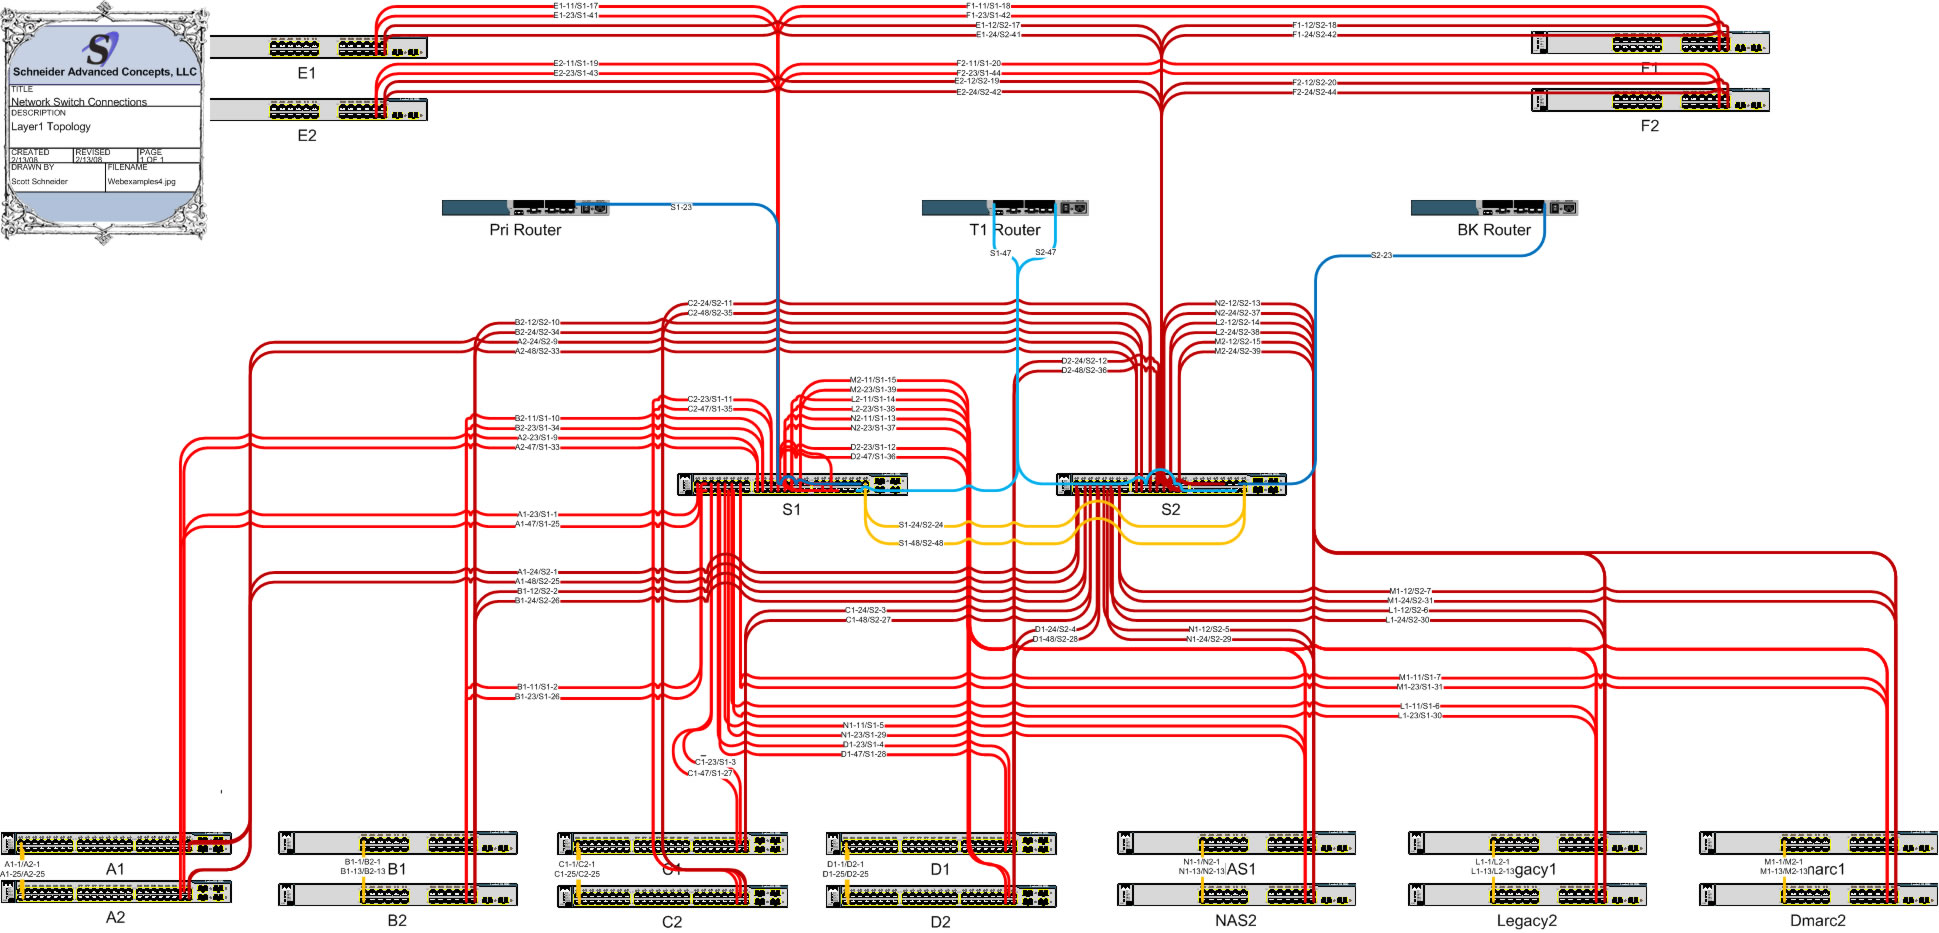 schneider advanced concepts  llc  diagramming and documentationlayer network diagram  middot  layer network diagram  middot  layer network diagram